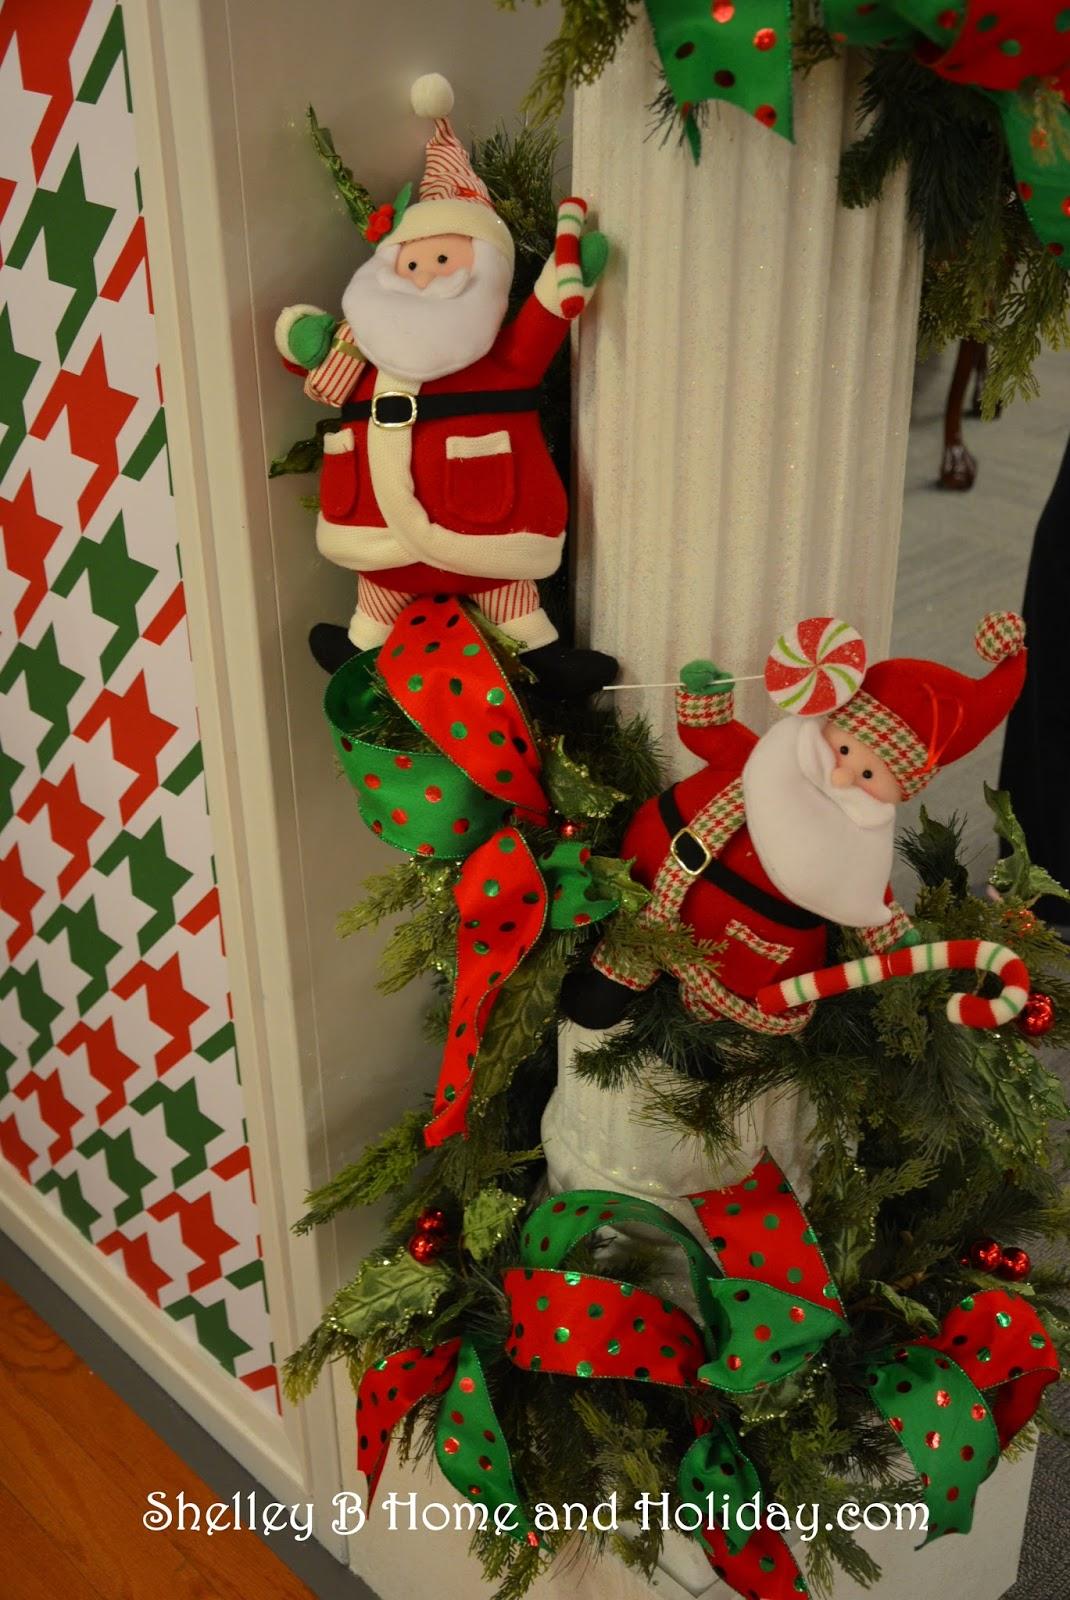 RAZ Christmas at Shelley B Home and Holiday: January 2016